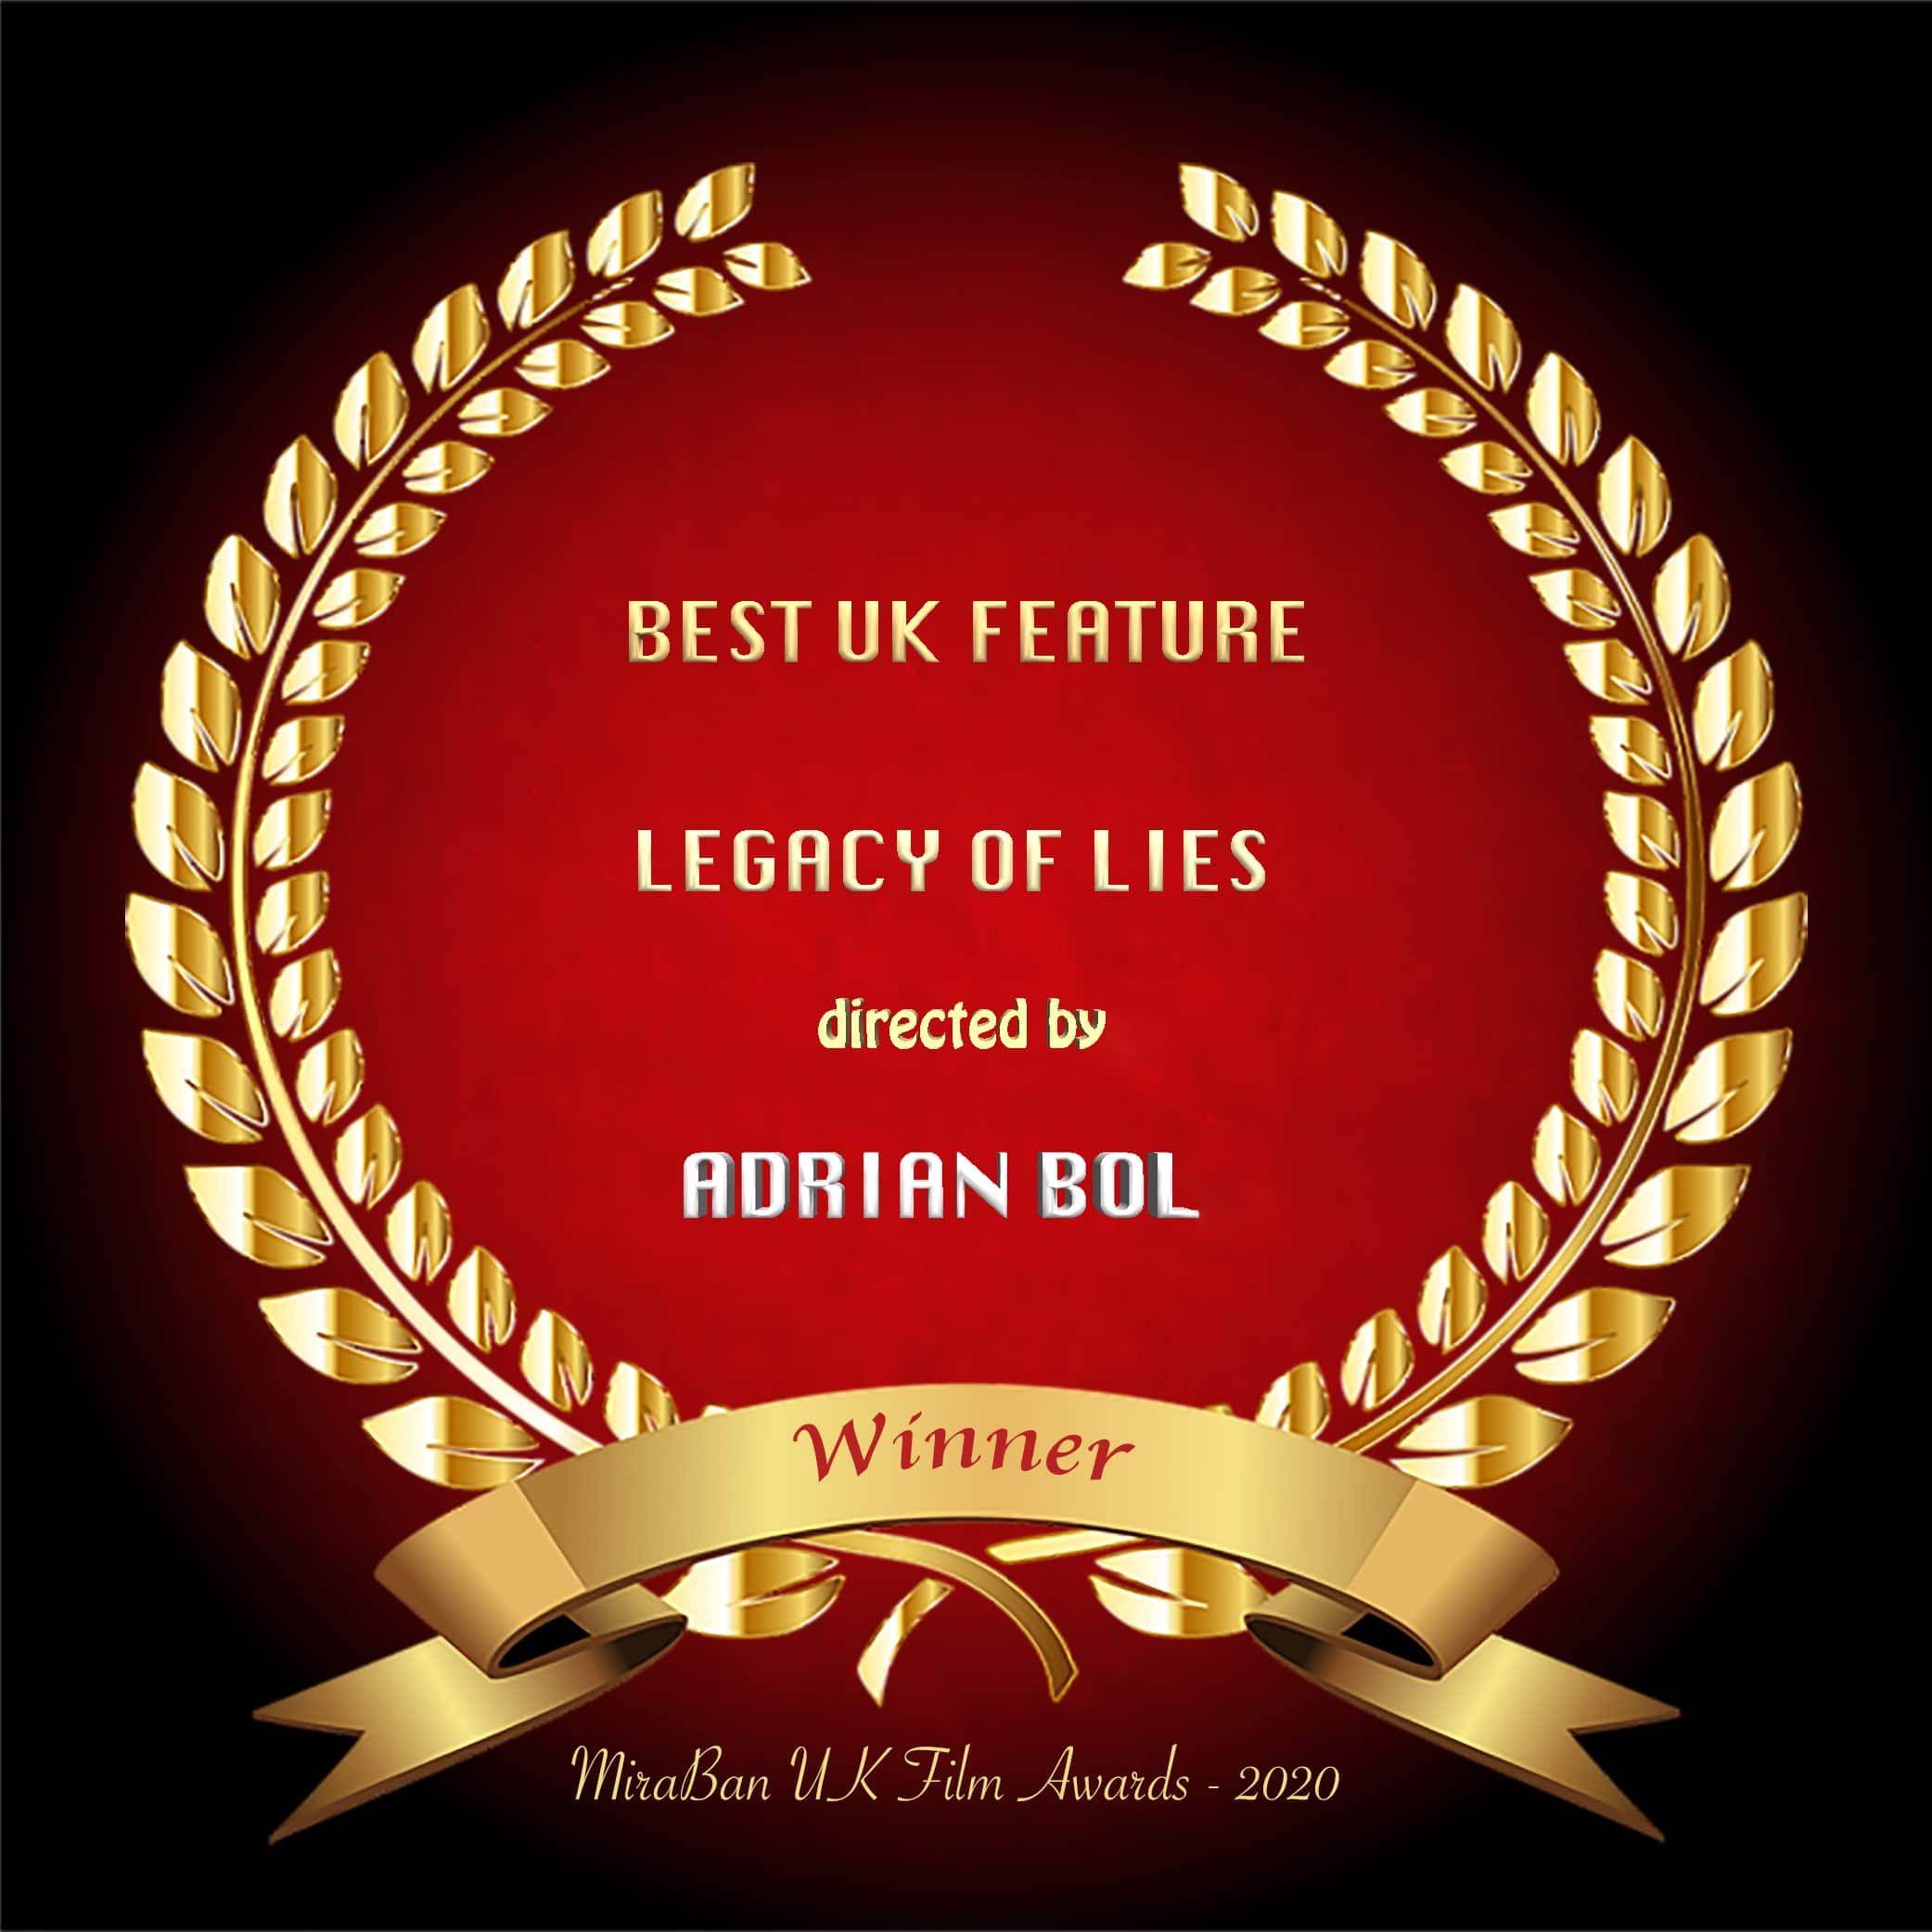 Best UK Feature